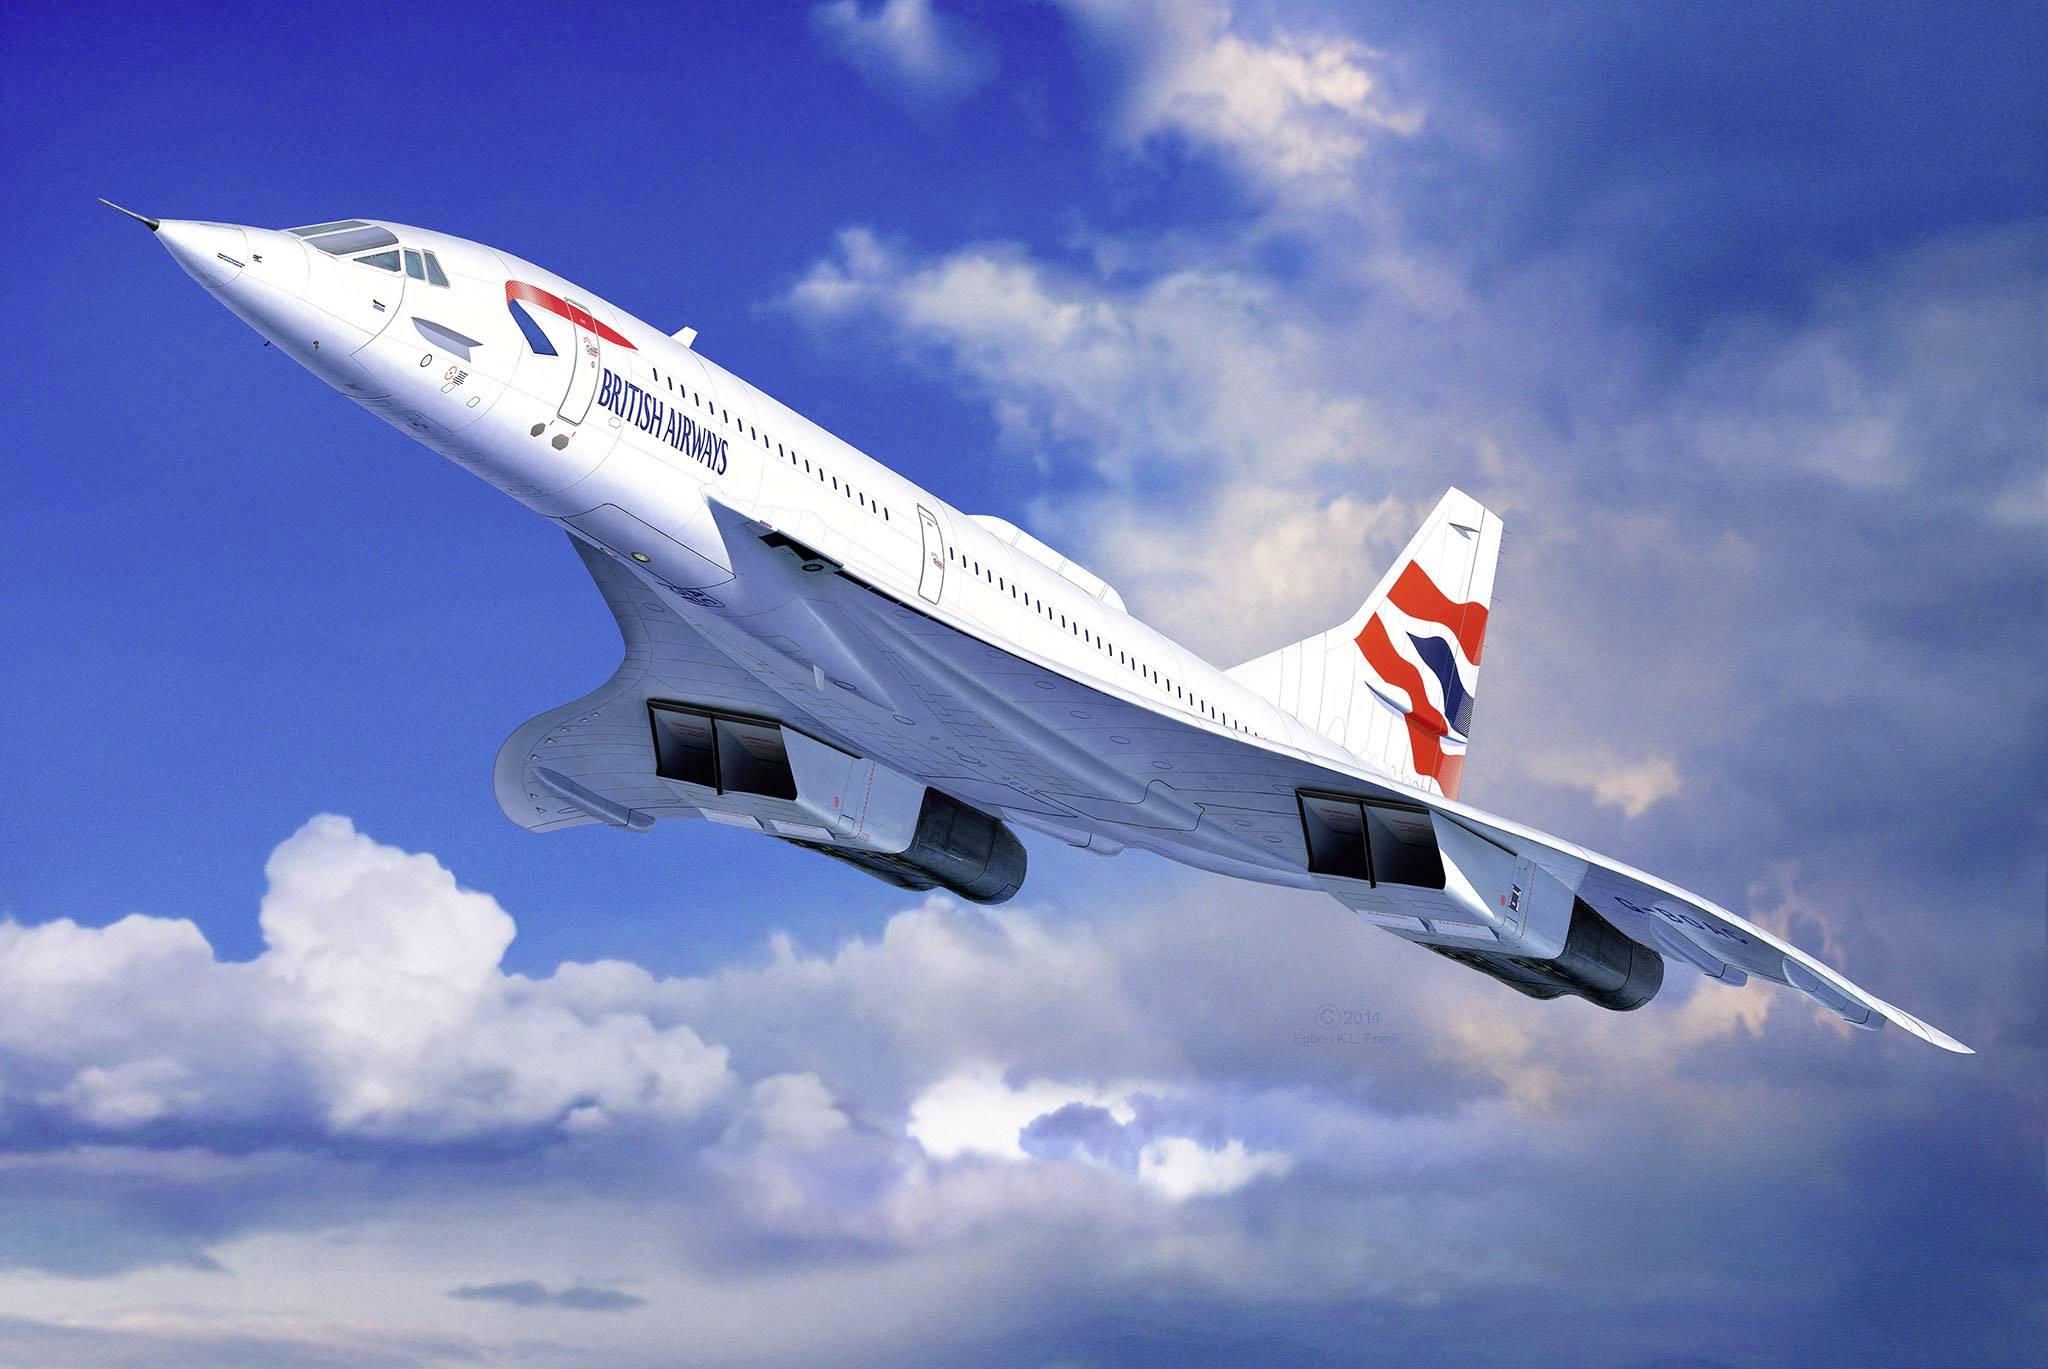 Model lietadla, stavebnica Revell Concorde British Airways 4997, 1:72